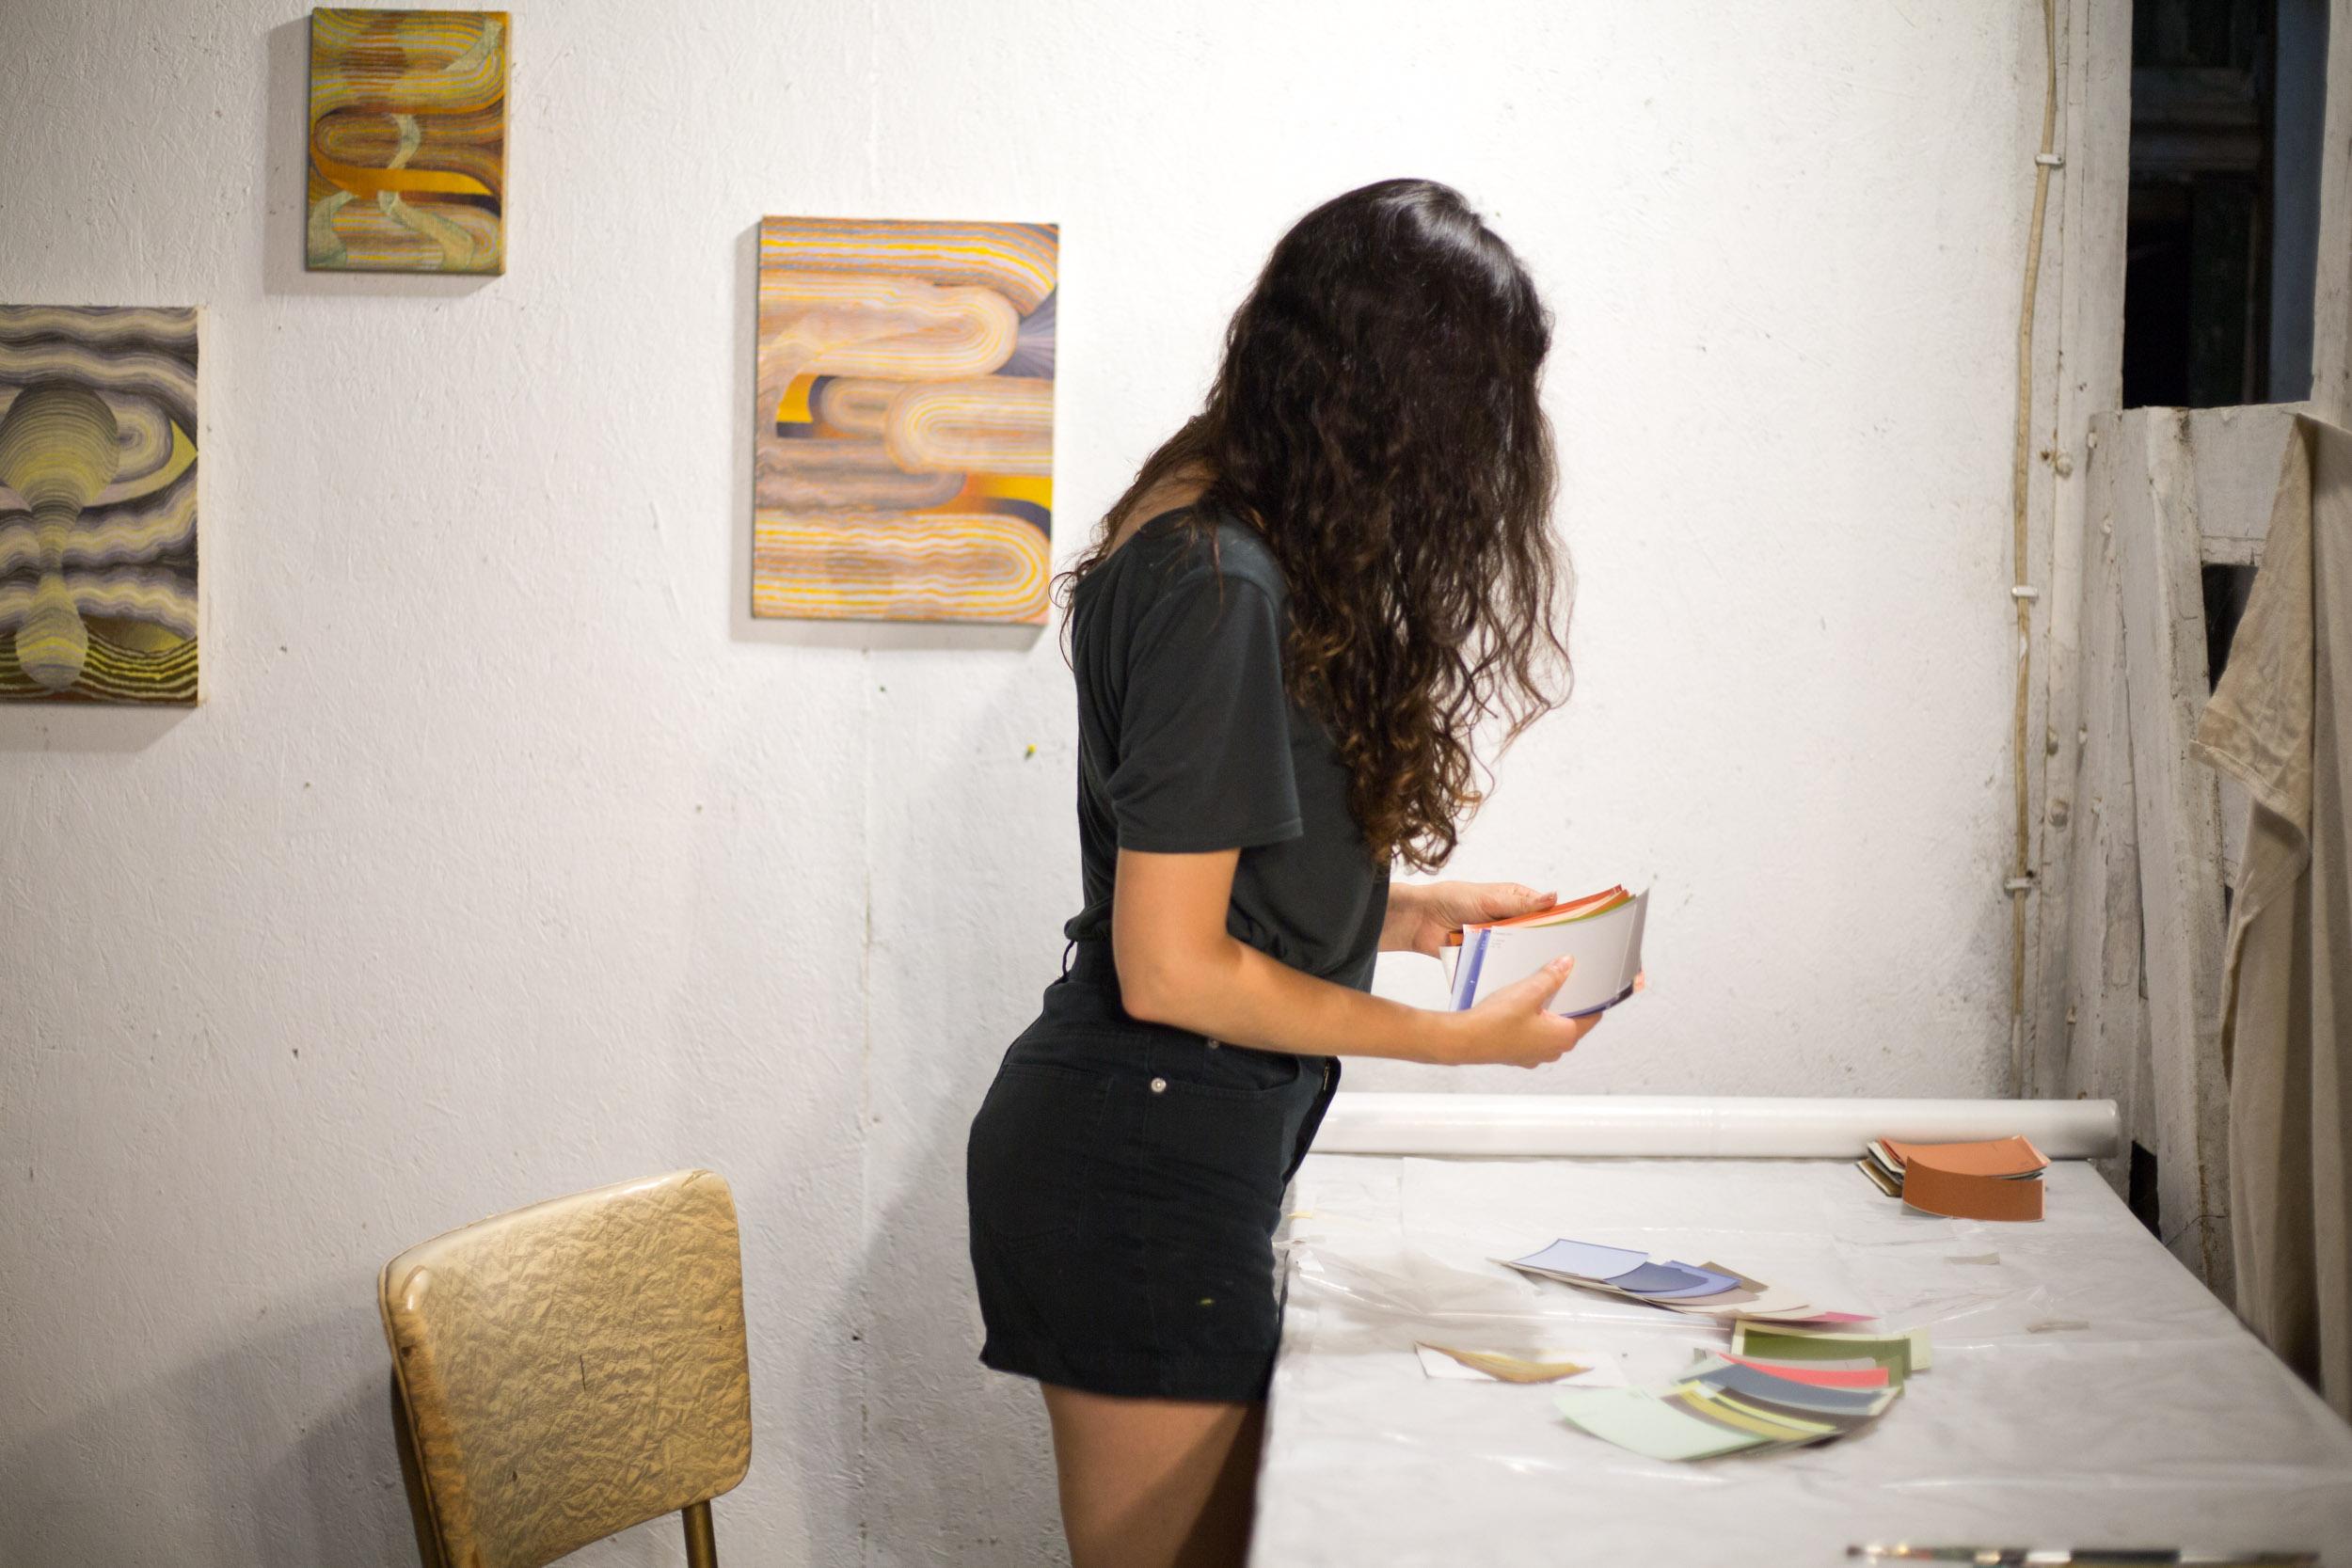 wassaic-project-artist-theresa-daddezio-2018-08-28-11-15-44.jpg